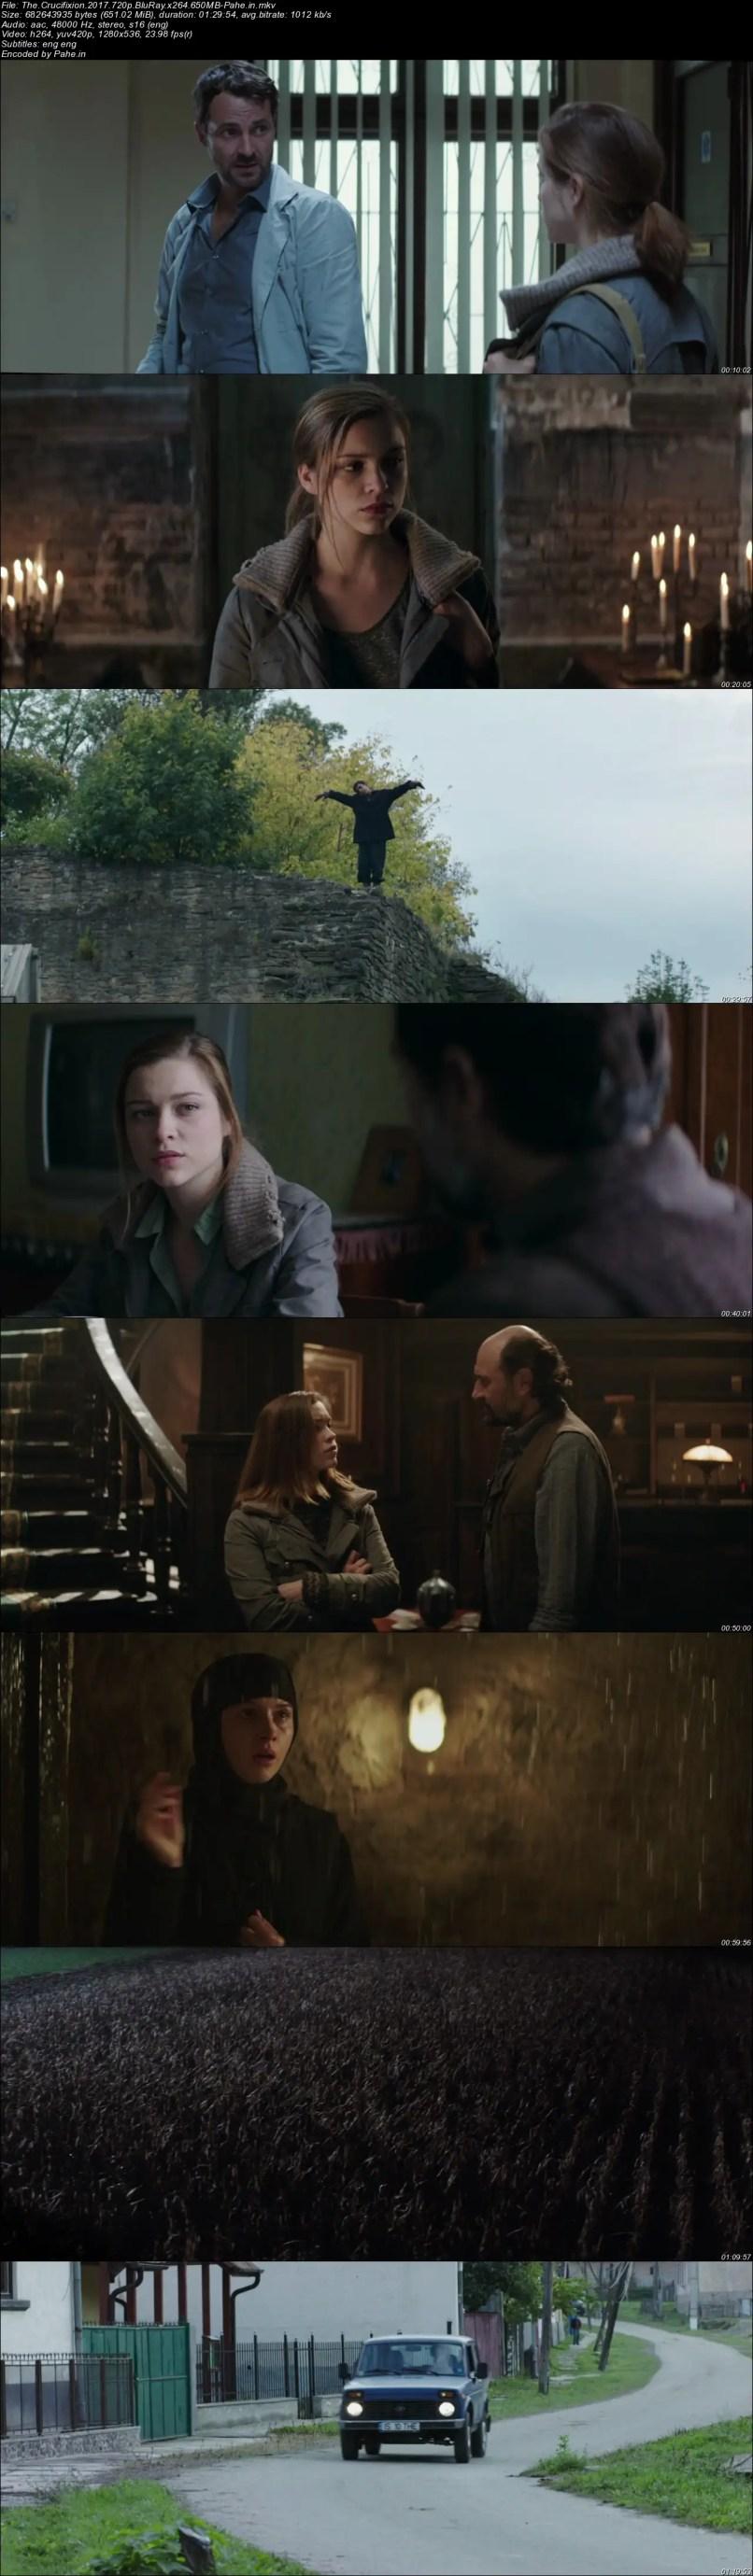 Game Of Thrones Season 5 Episode 6 Subtitles Arabic